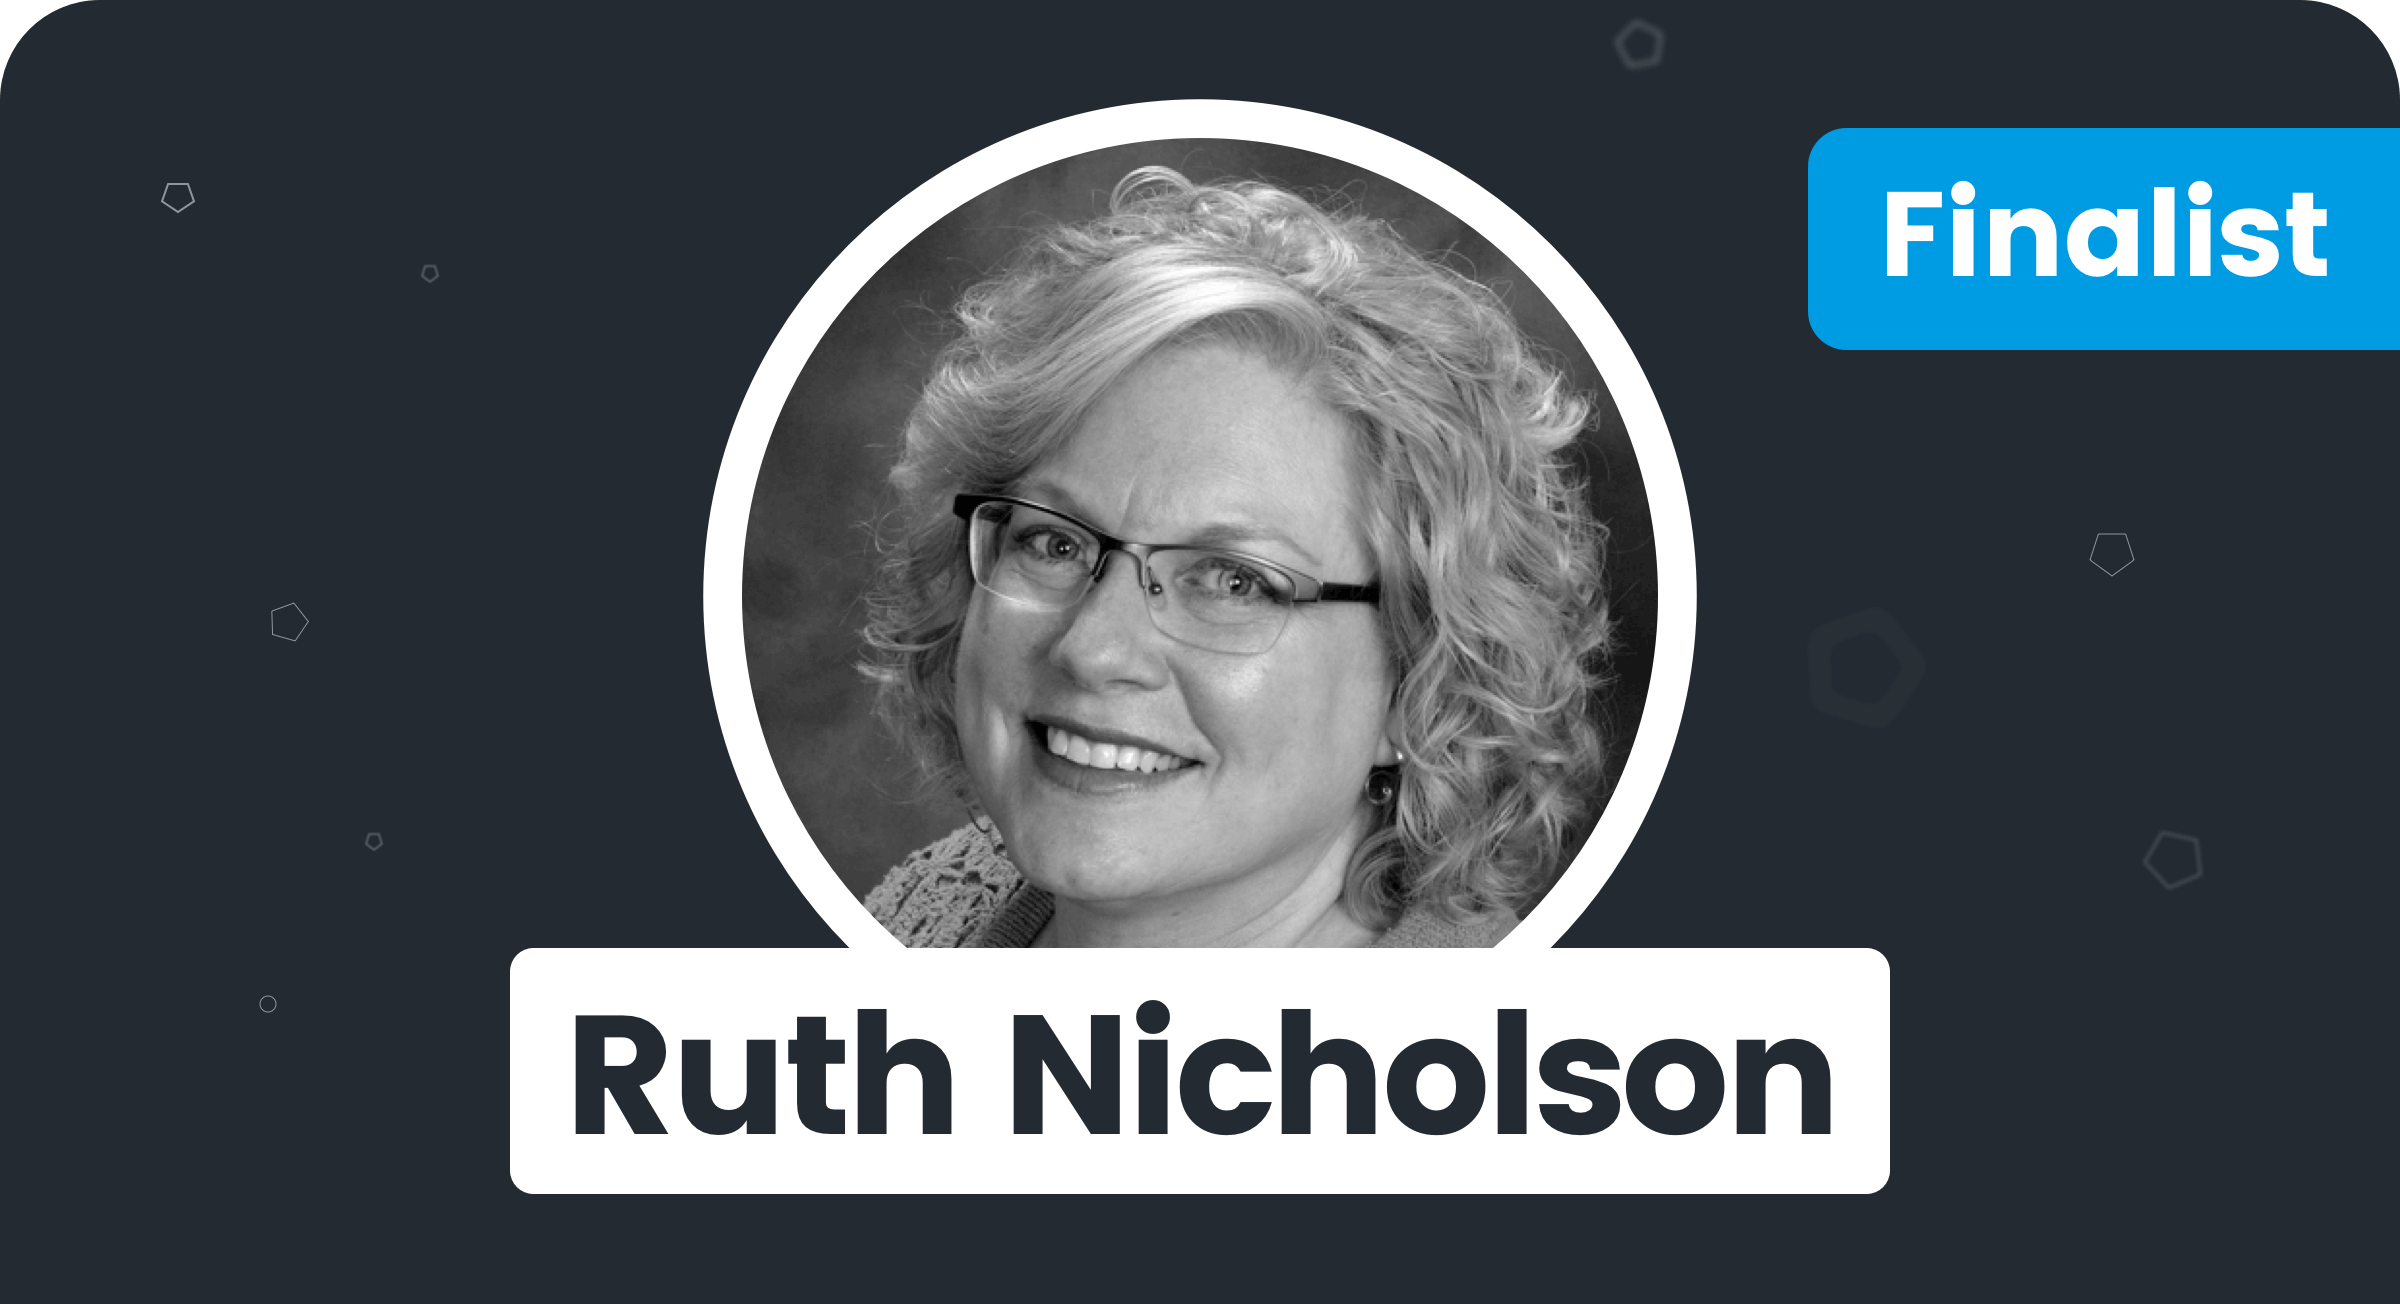 Ruth Nicholson - Finalist